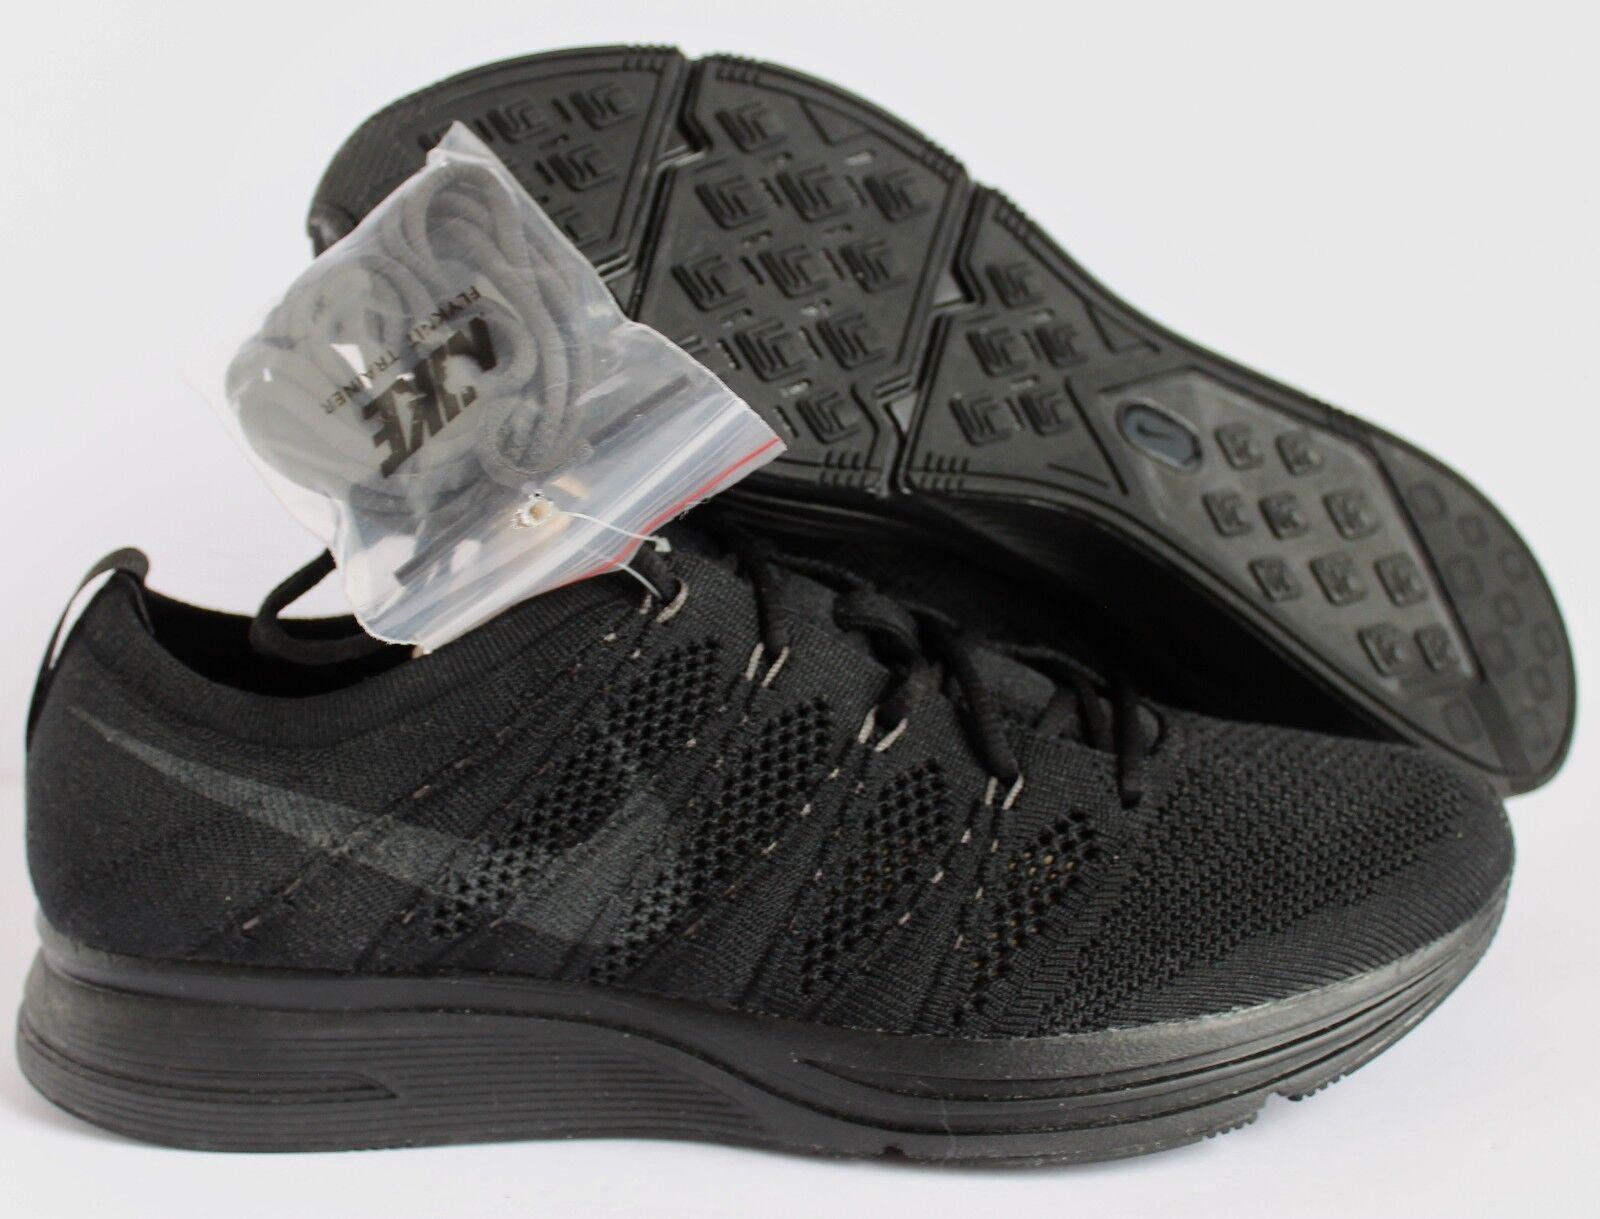 Nike sz Flyknit Trainer Triple Noir Anthracite Hommes sz Nike 7 // wmns 8.5 df13a7